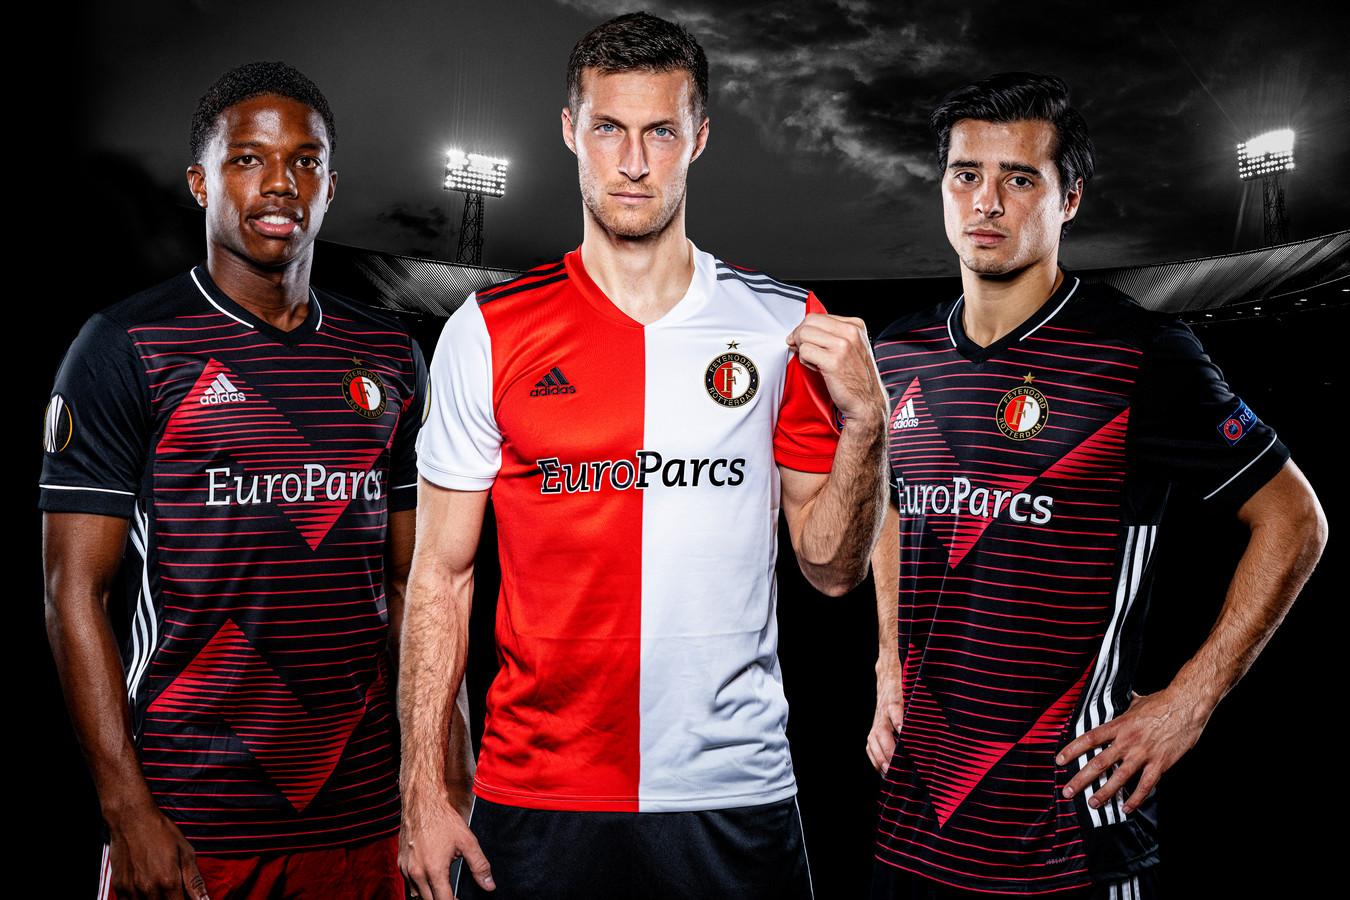 Tyrell Malacia, Uros Spajic en João Teixeira in het nieuwe Europese shirt.